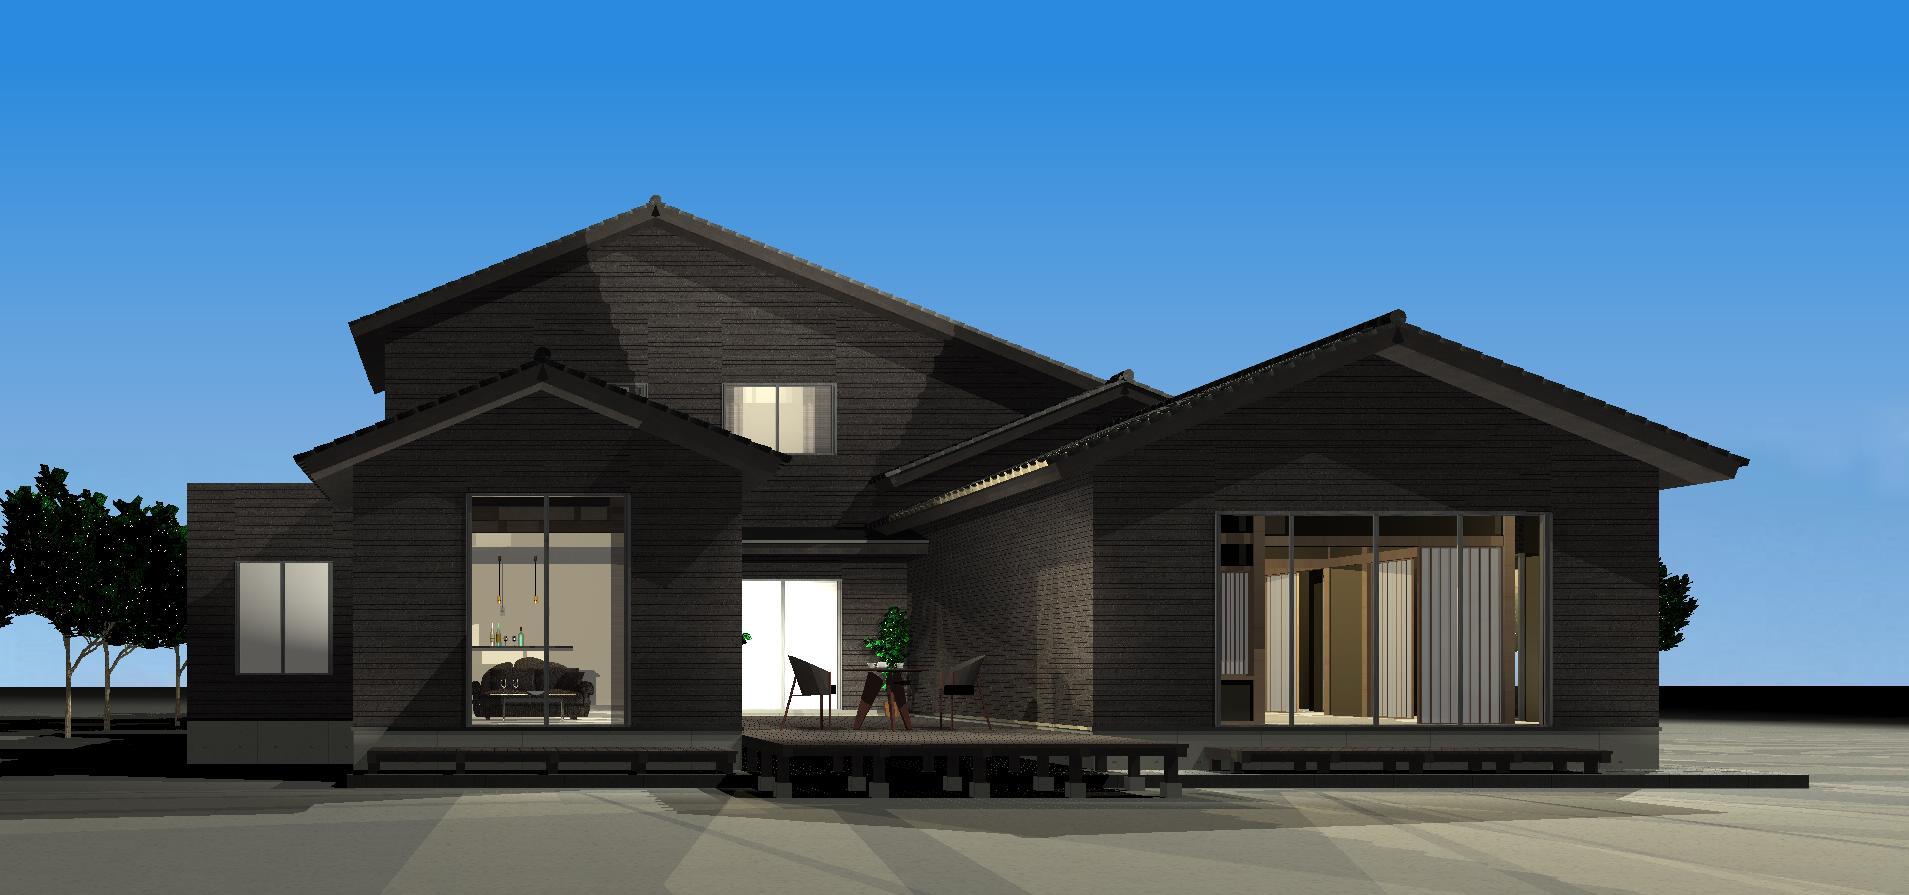 3Dパース   Tu house001